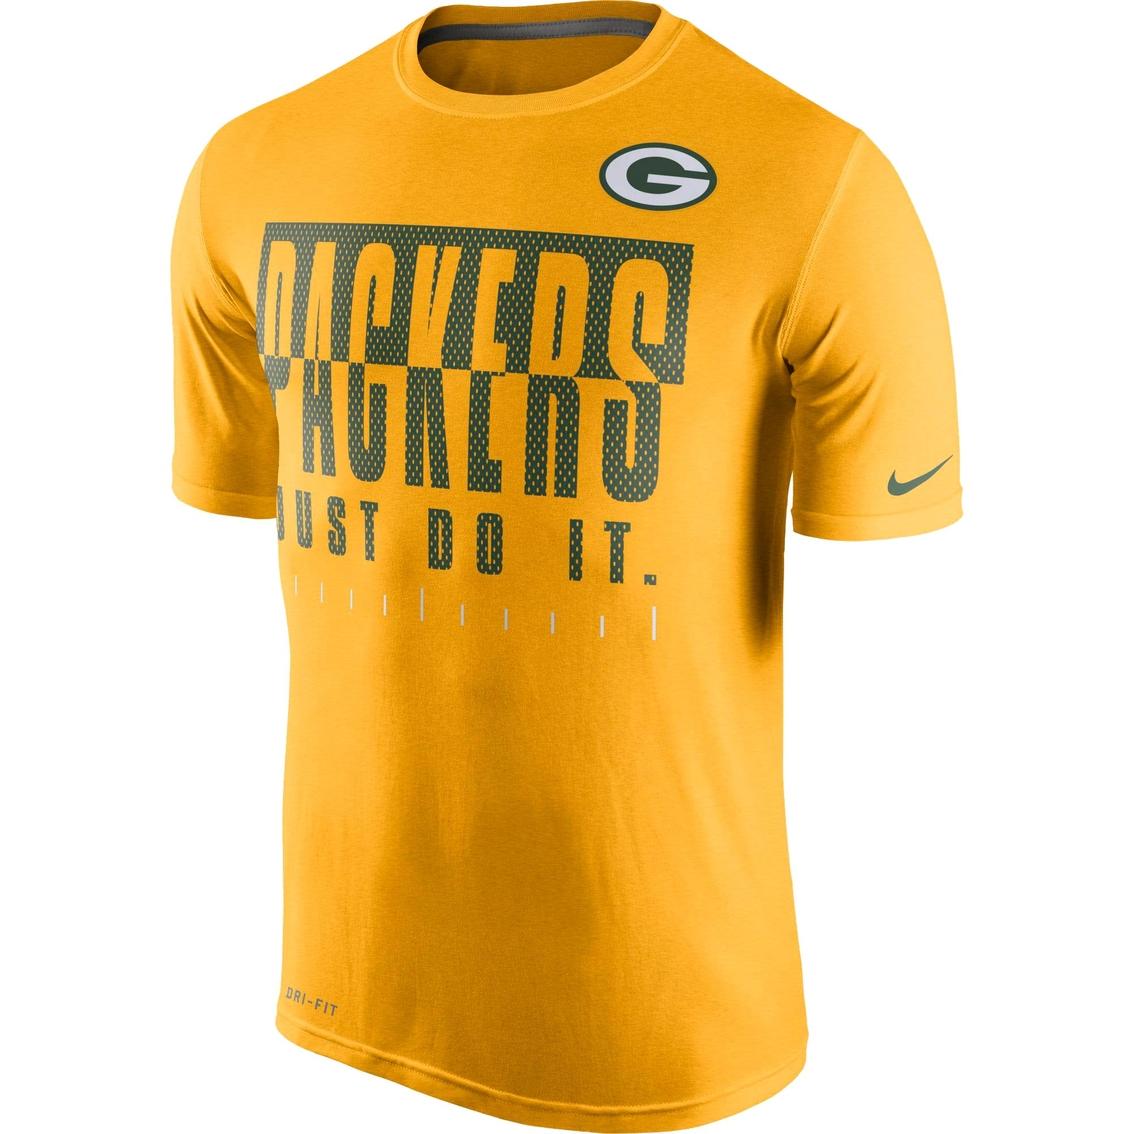 Nike Nfl Green Bay Packers Men S Legend Just Do It Tee